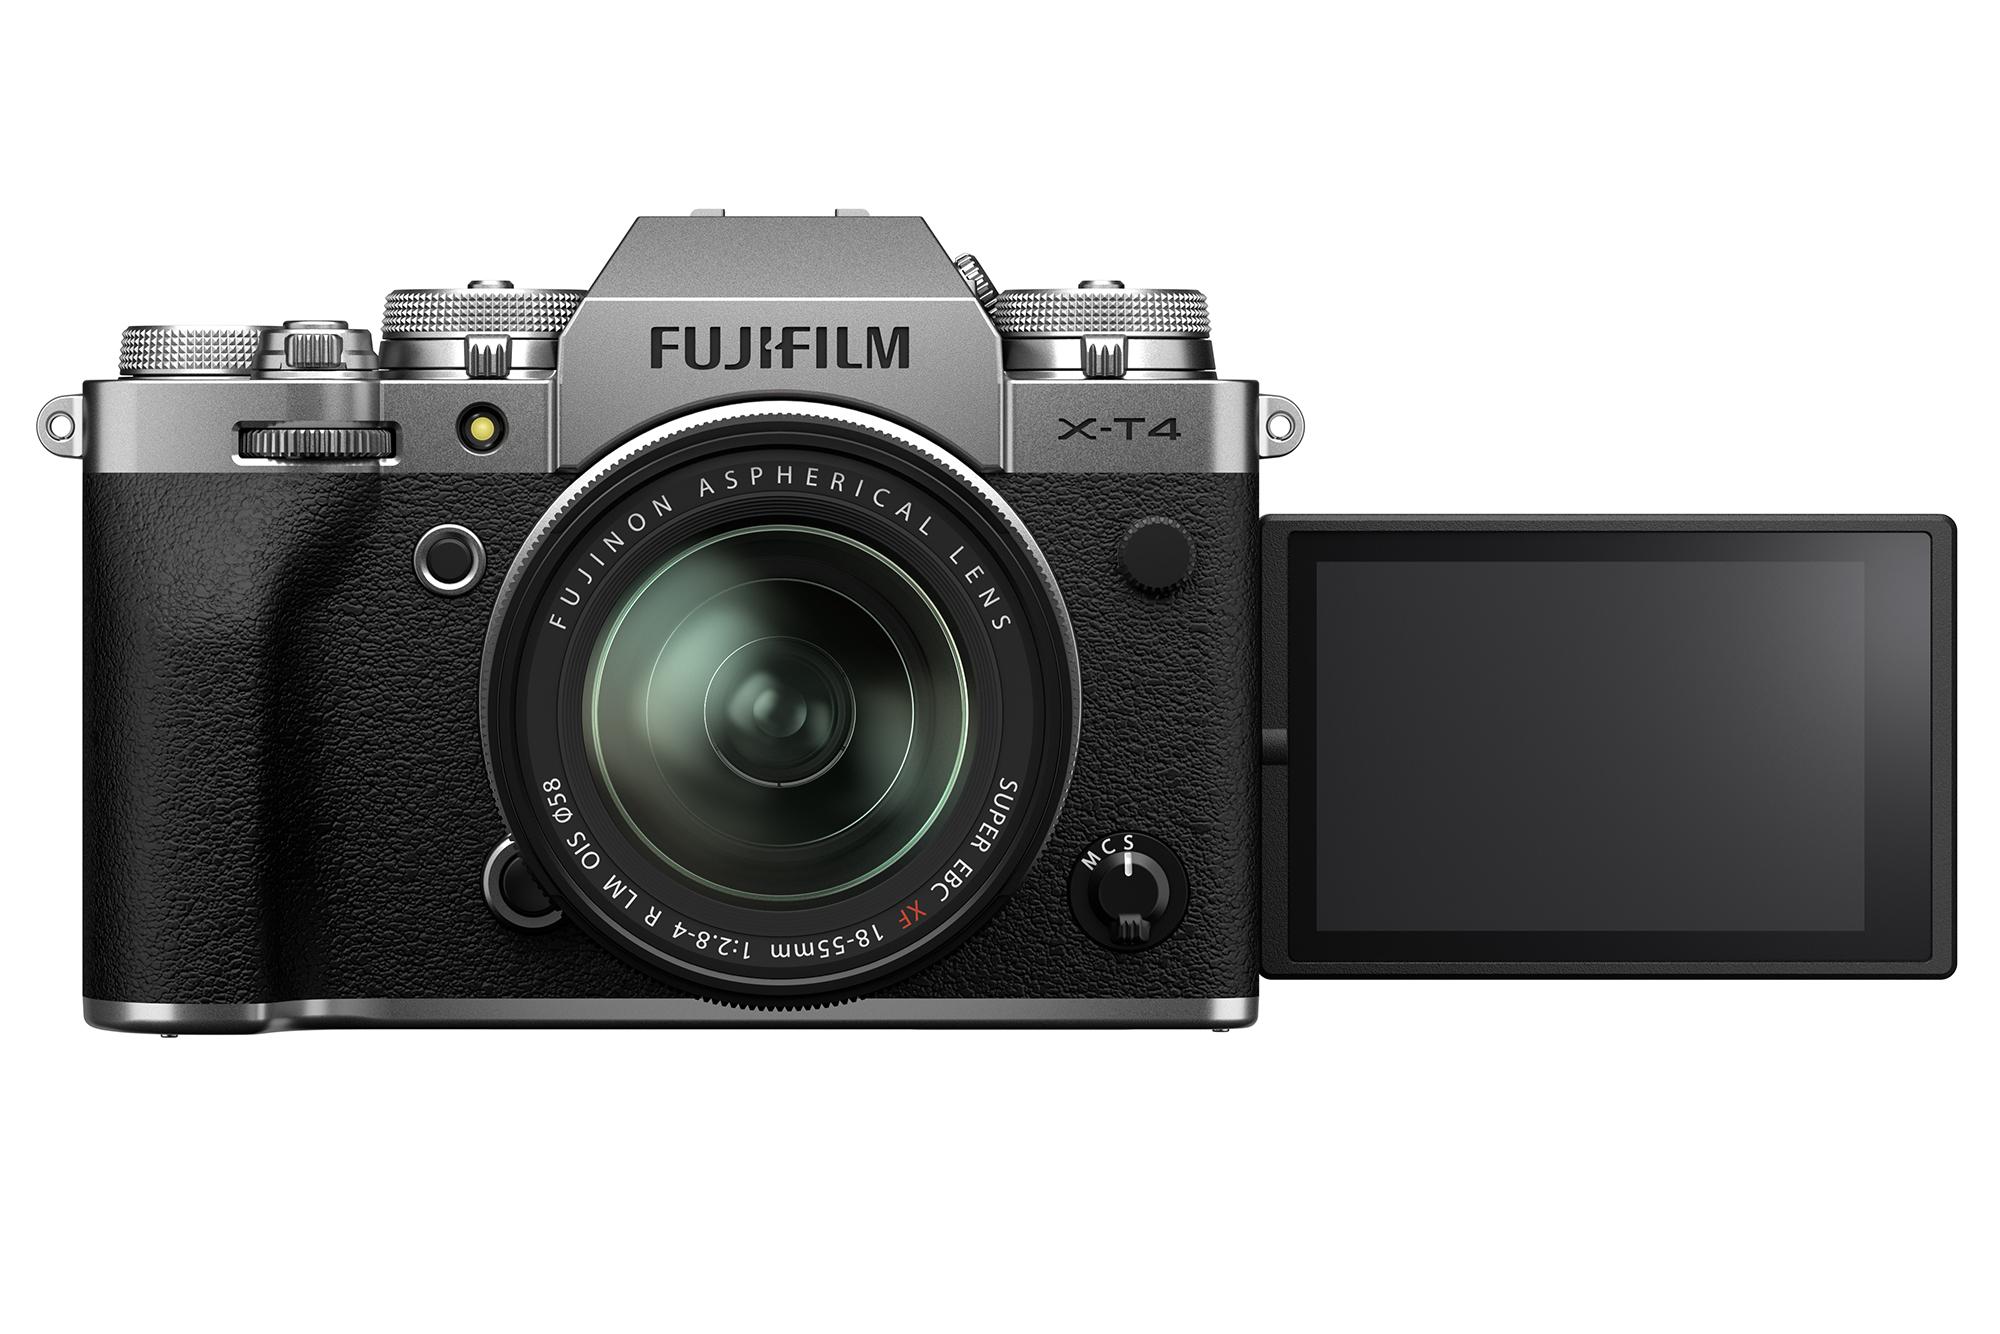 Schwenkdisplay Fujifilm X-T4